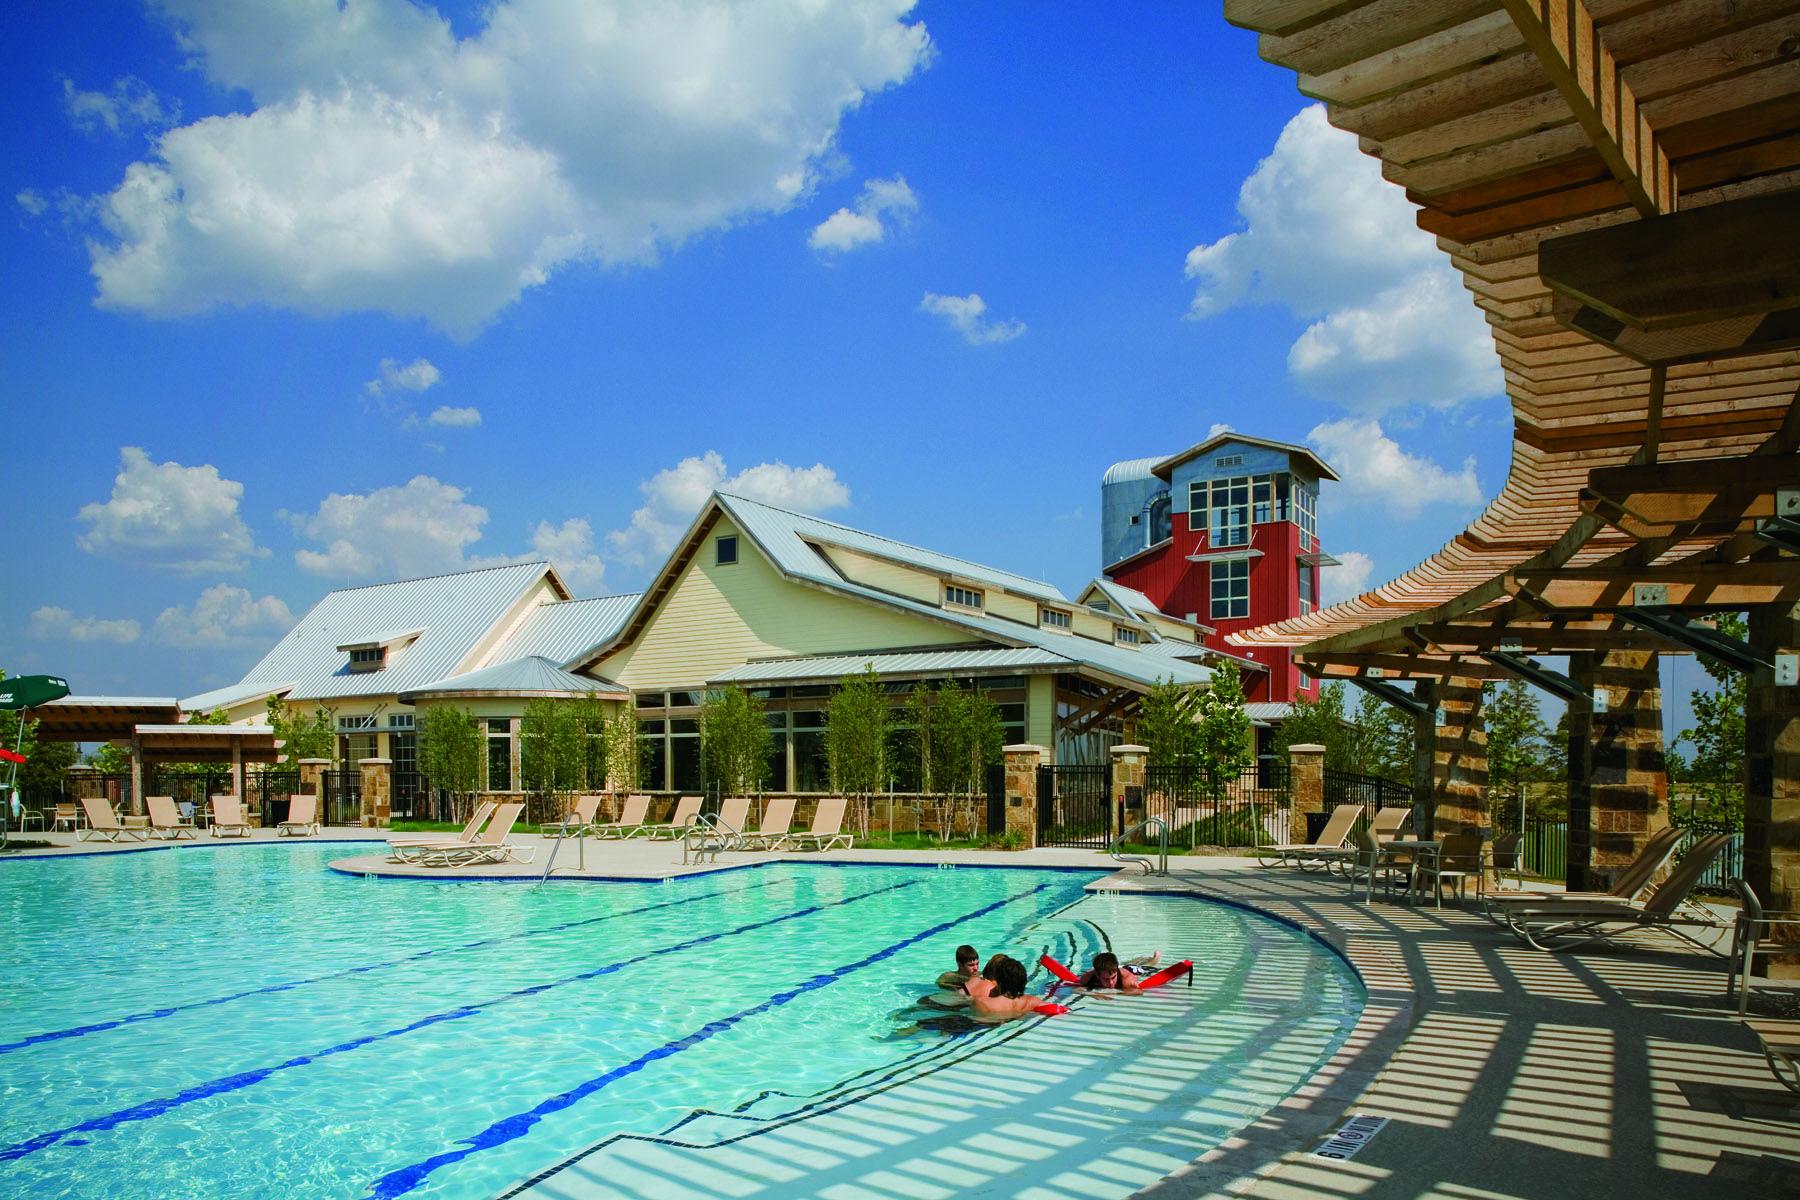 A Pool In Cross Creek Ranch Fulshear Park Model Homes Resort Style Pool